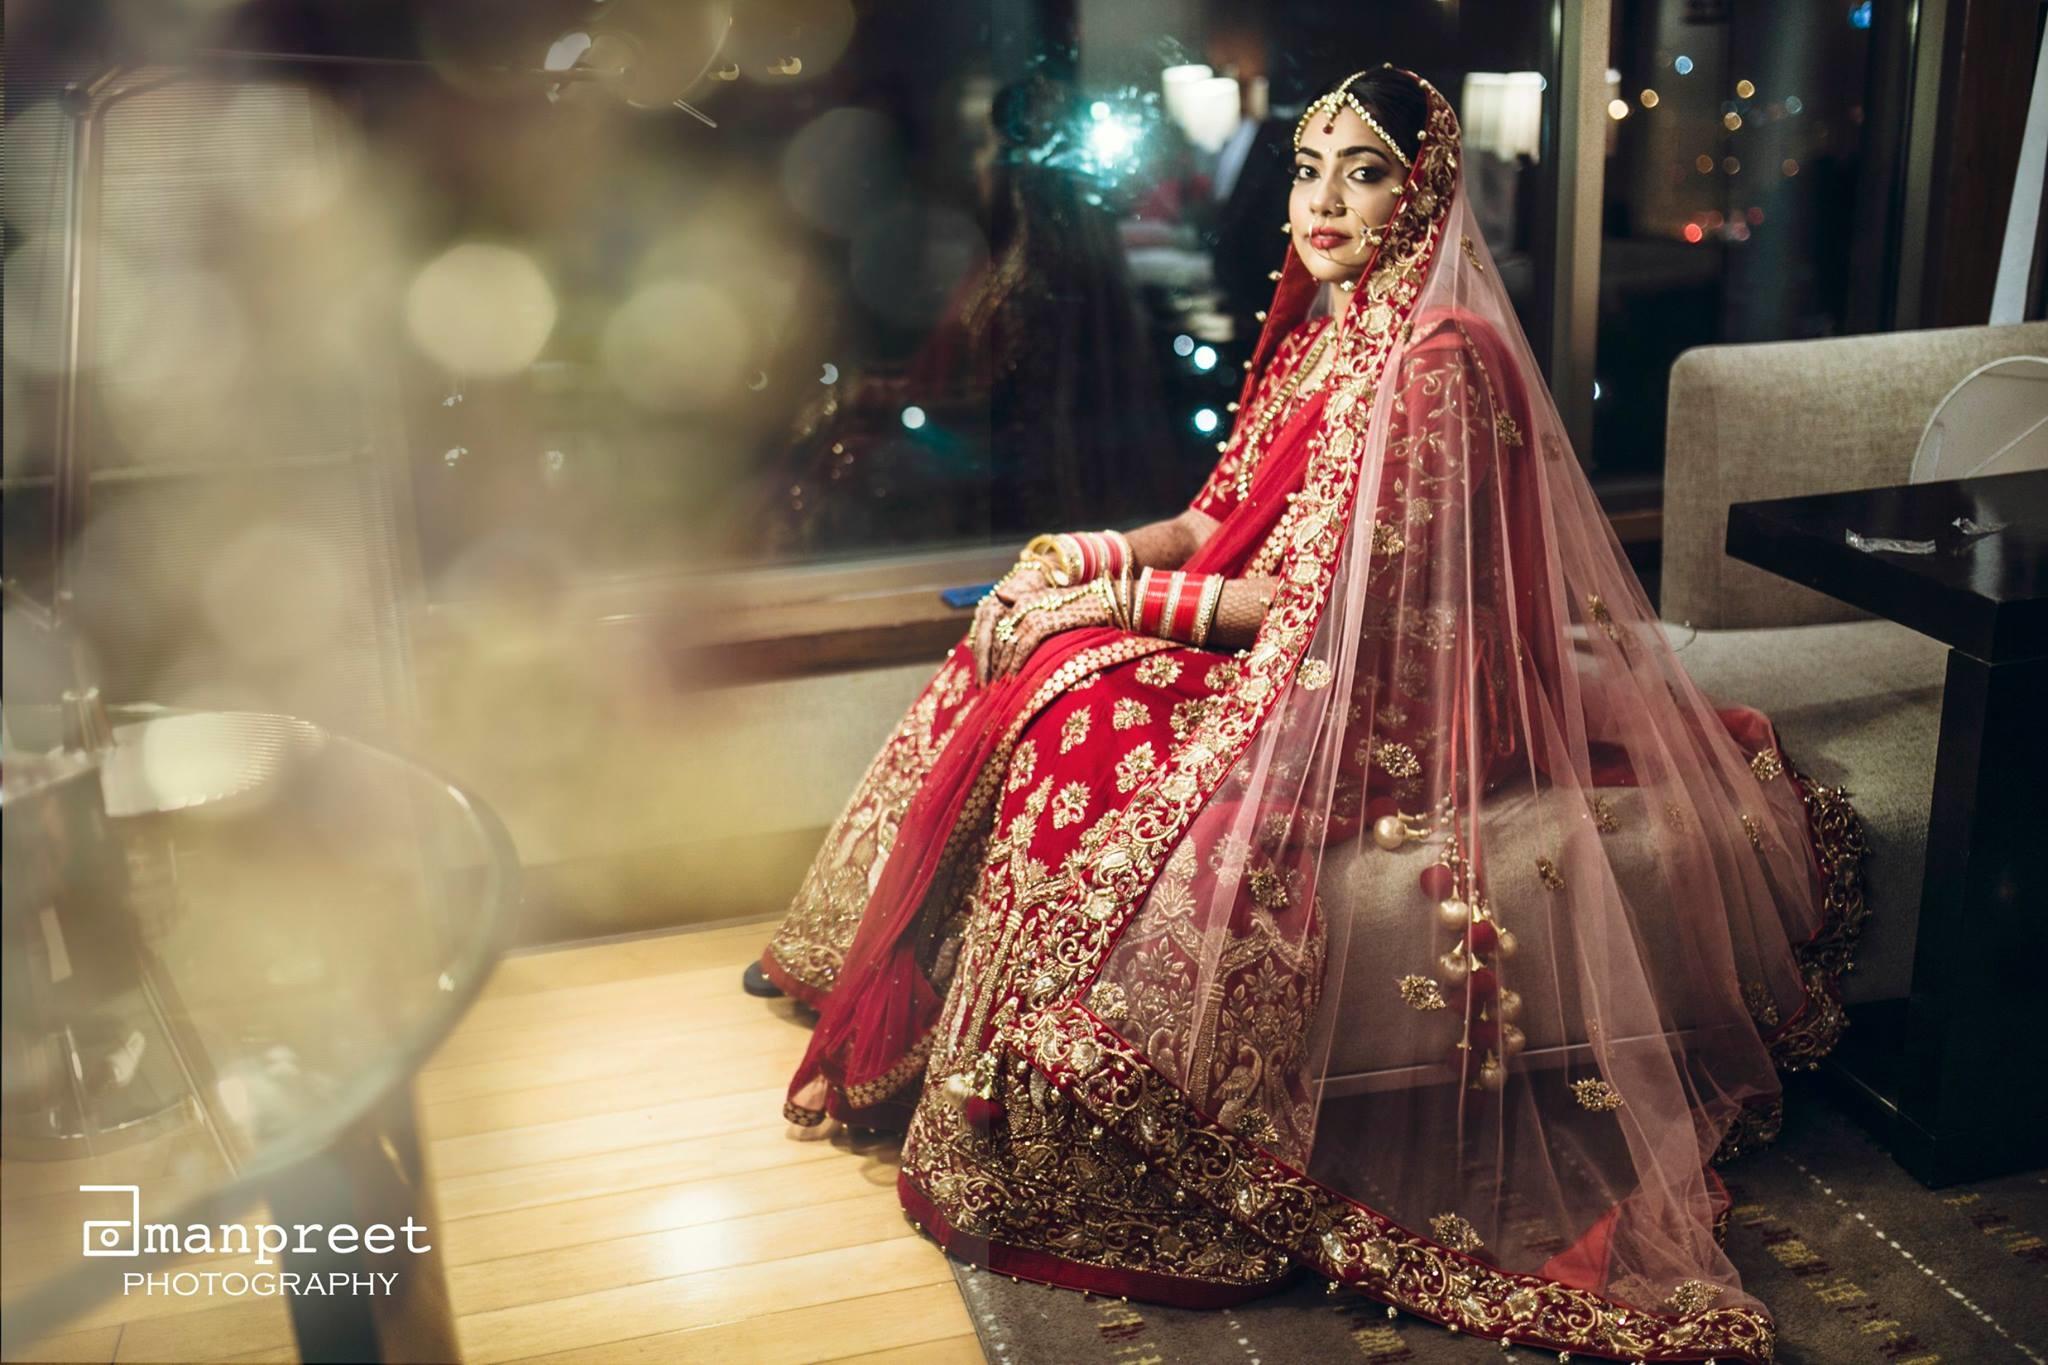 Amanpreet Kaur Photography